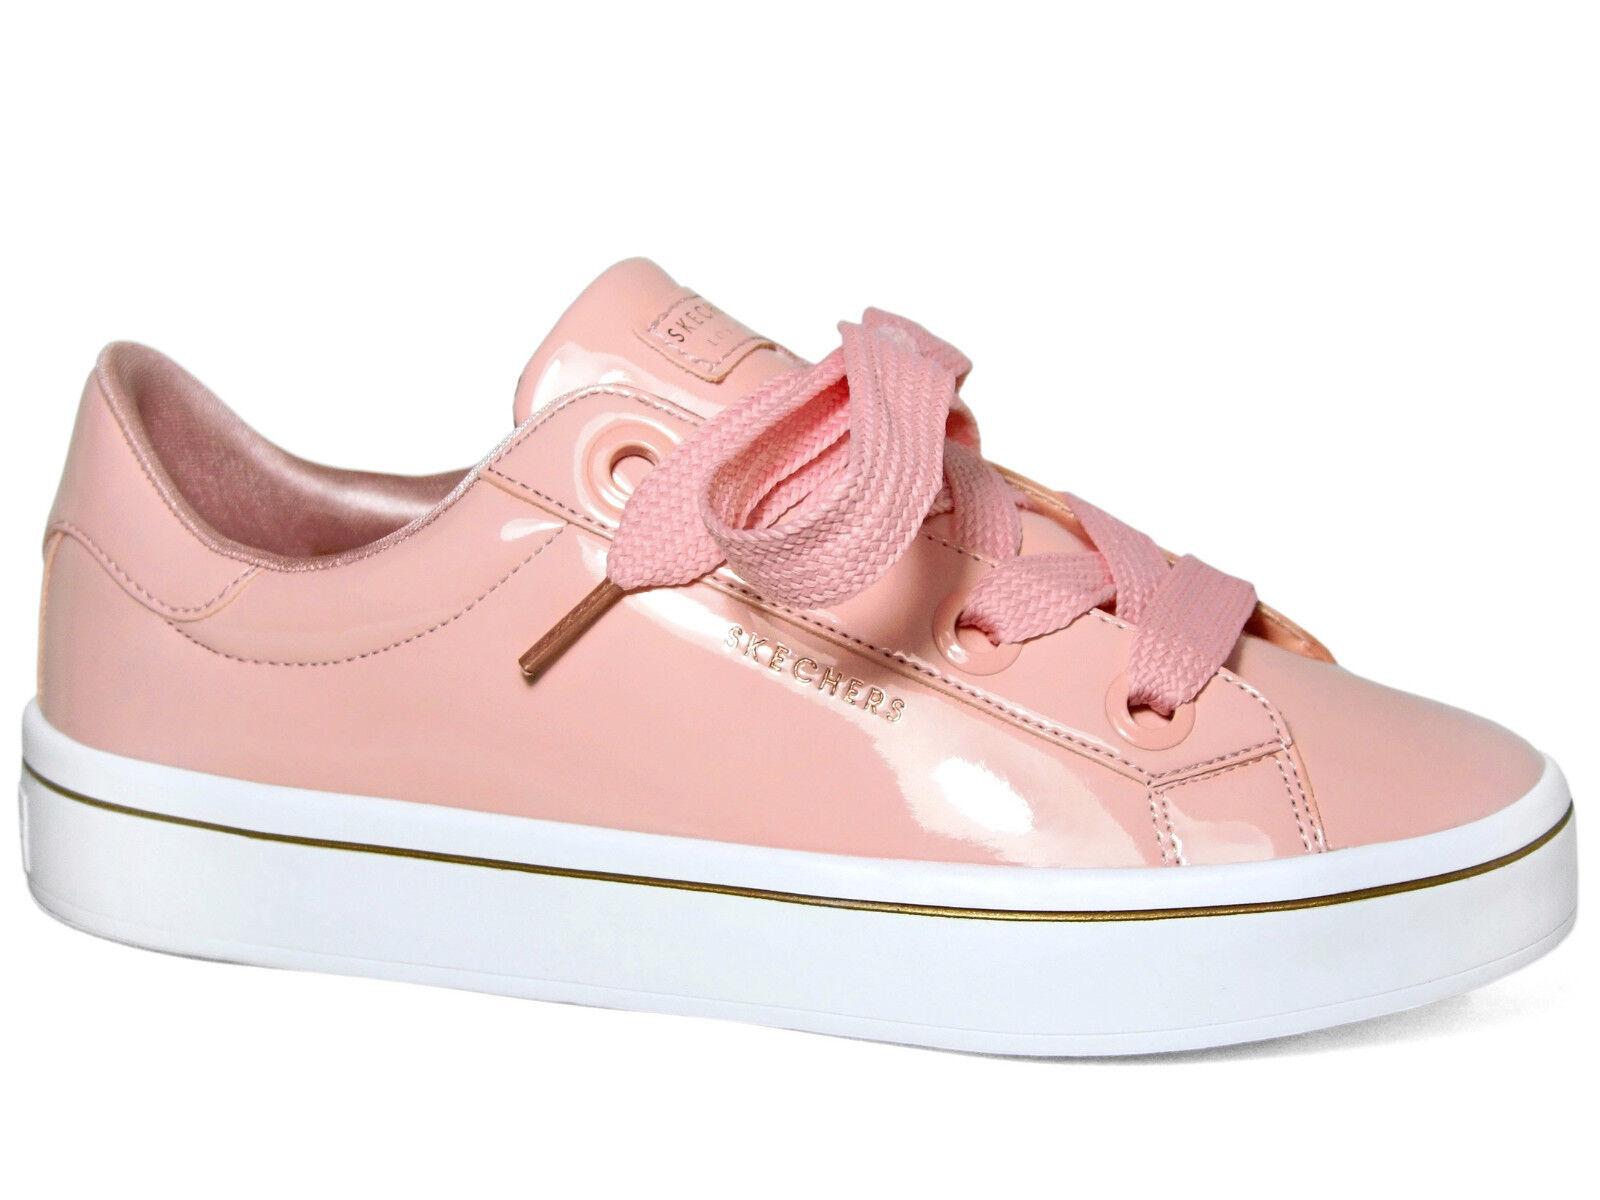 Skechers Hi-Lites Slick Schuhes Lack Sneakers Pink / Rosa 959/LTPK Damen Schuhe